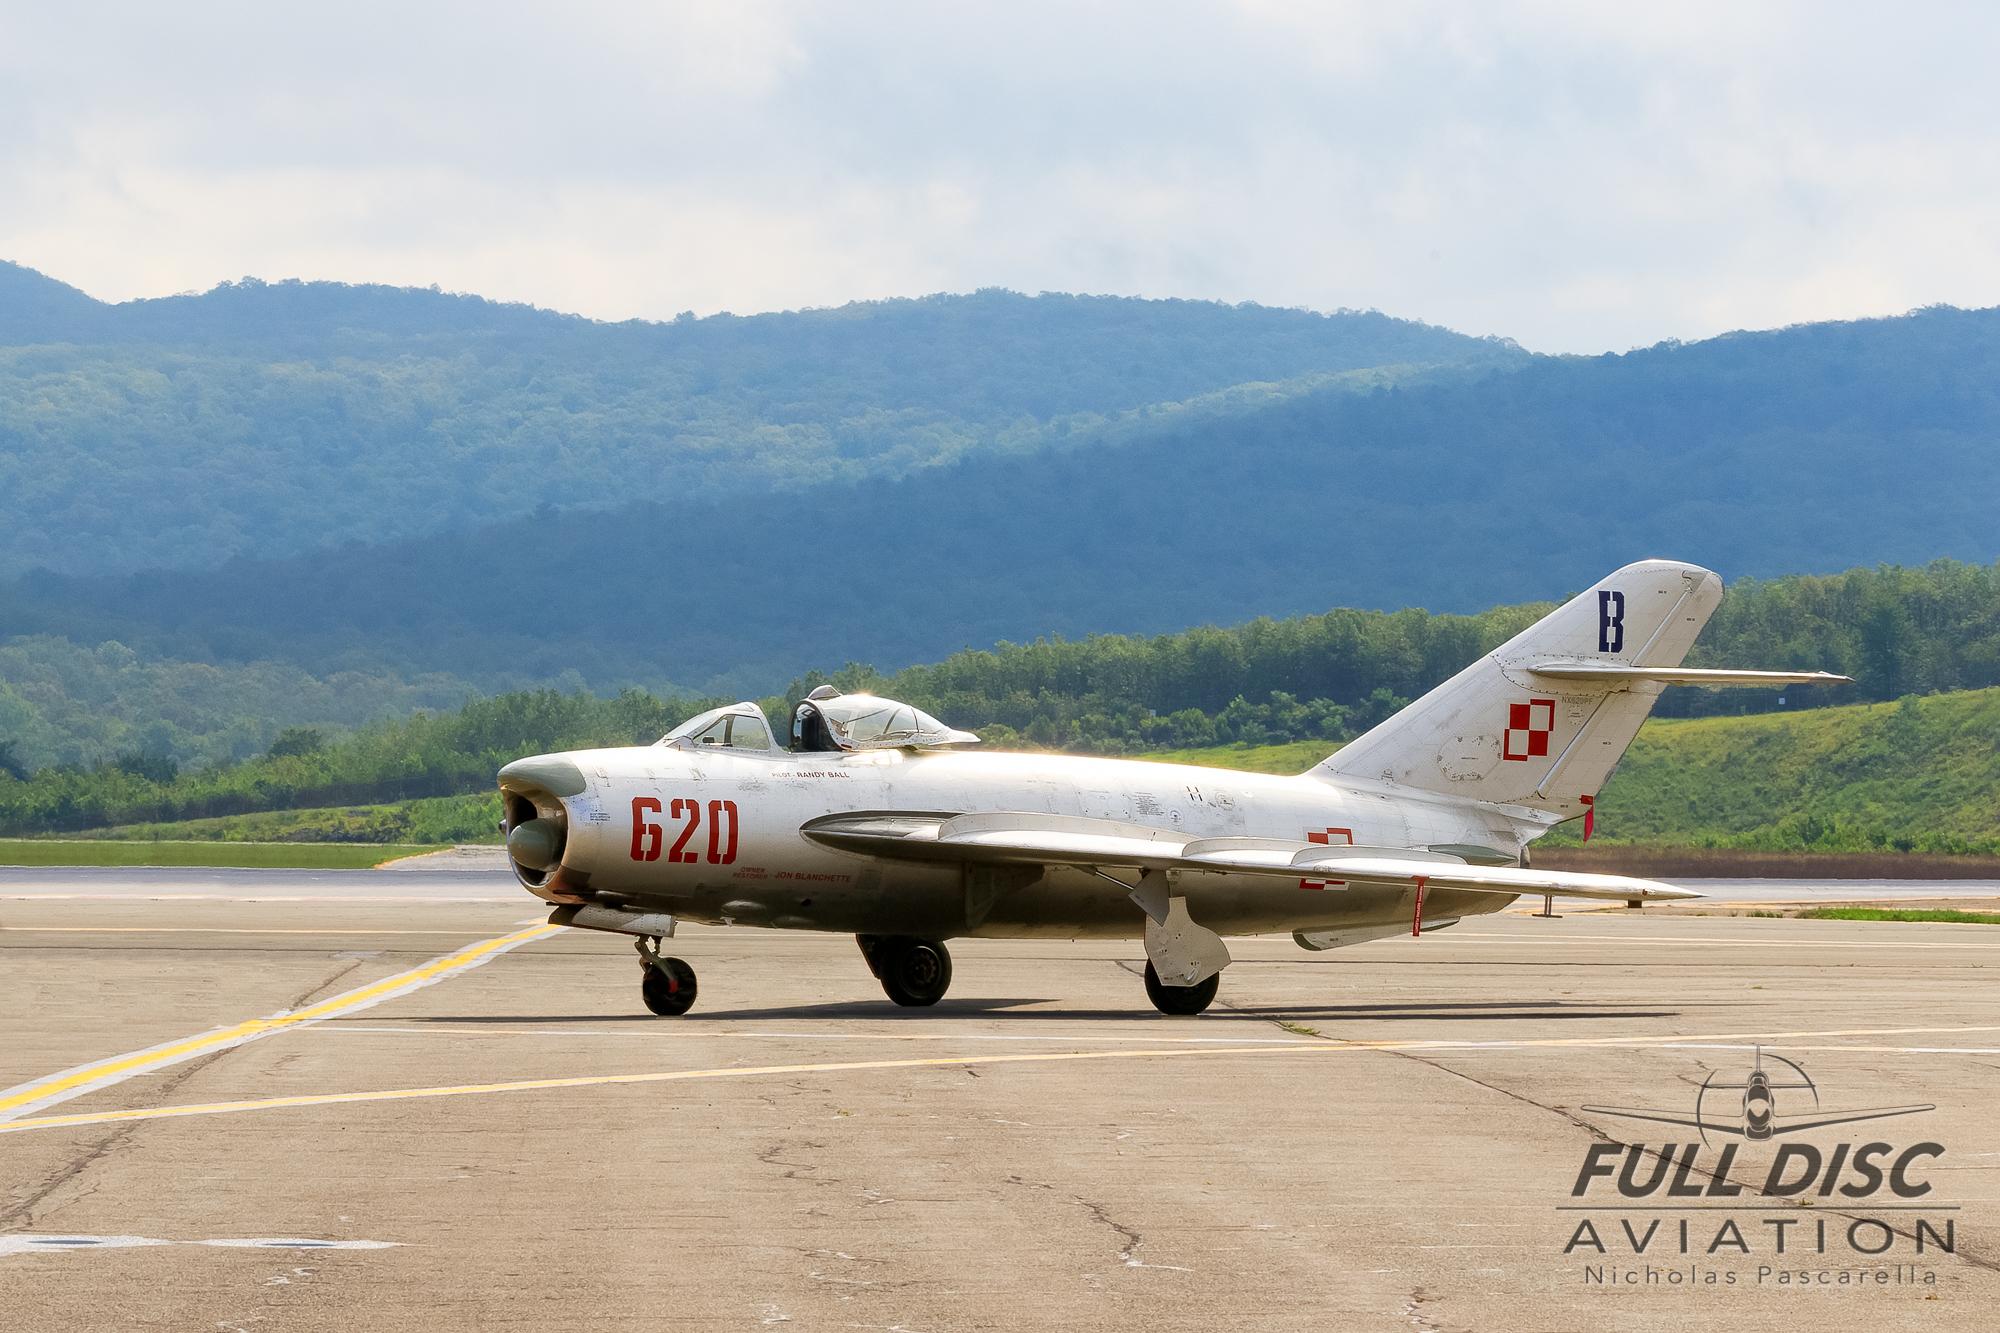 nickpascarella_nicholaspascarella_fulldiscaviation_aircraft_mig_morning.jpg